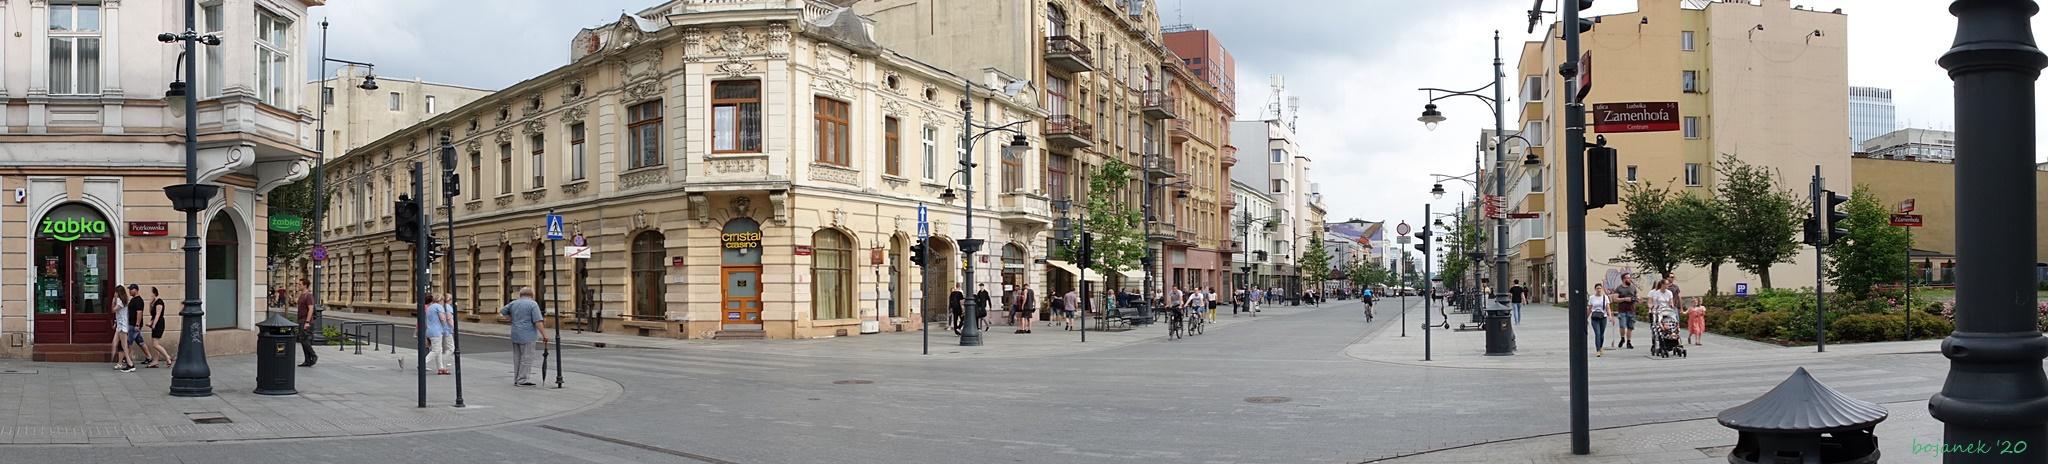 Piotrkowska 45